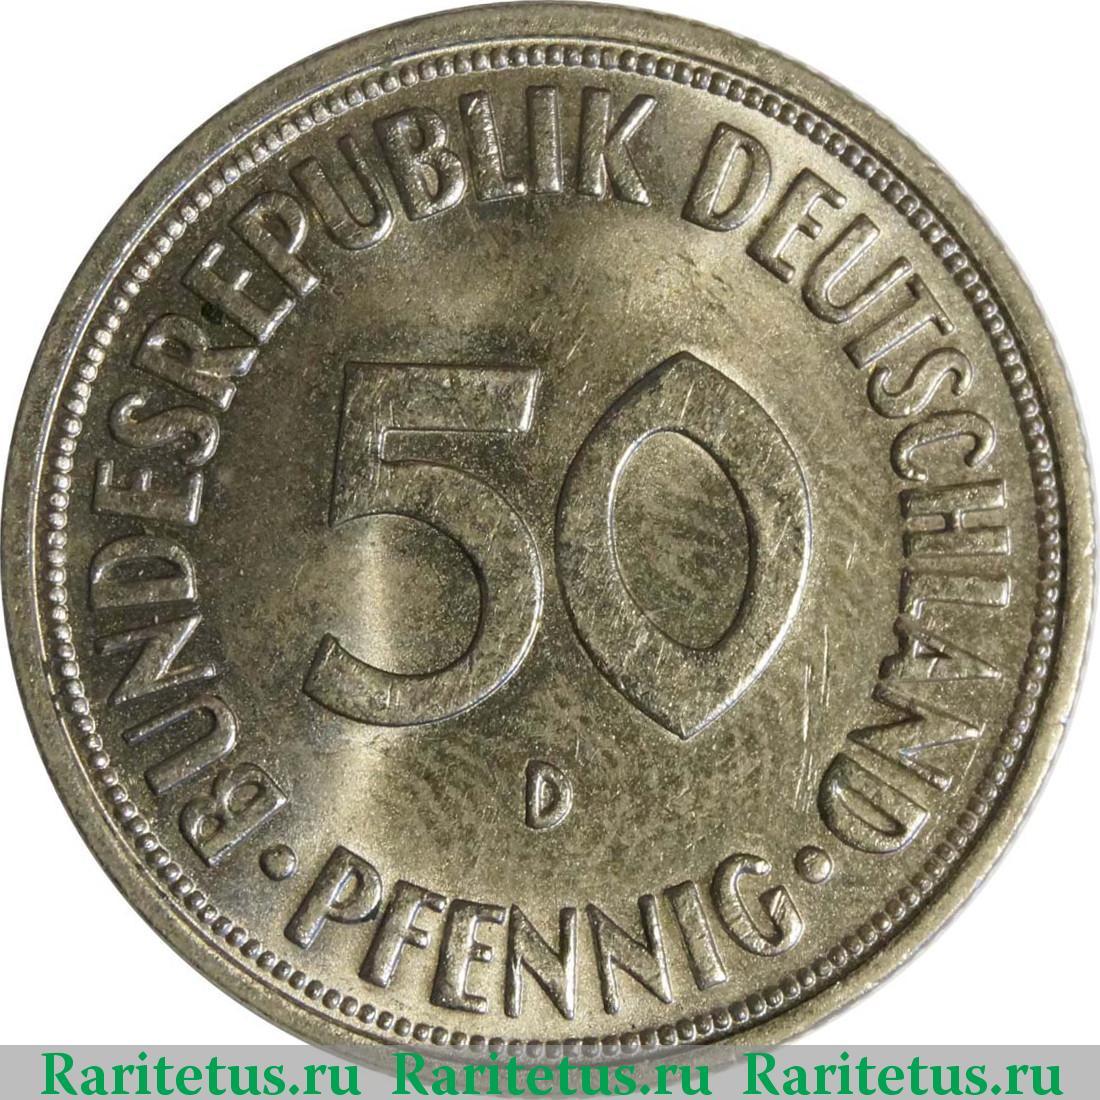 Монета 10 pfennig 1950 цена знак летчик без класса